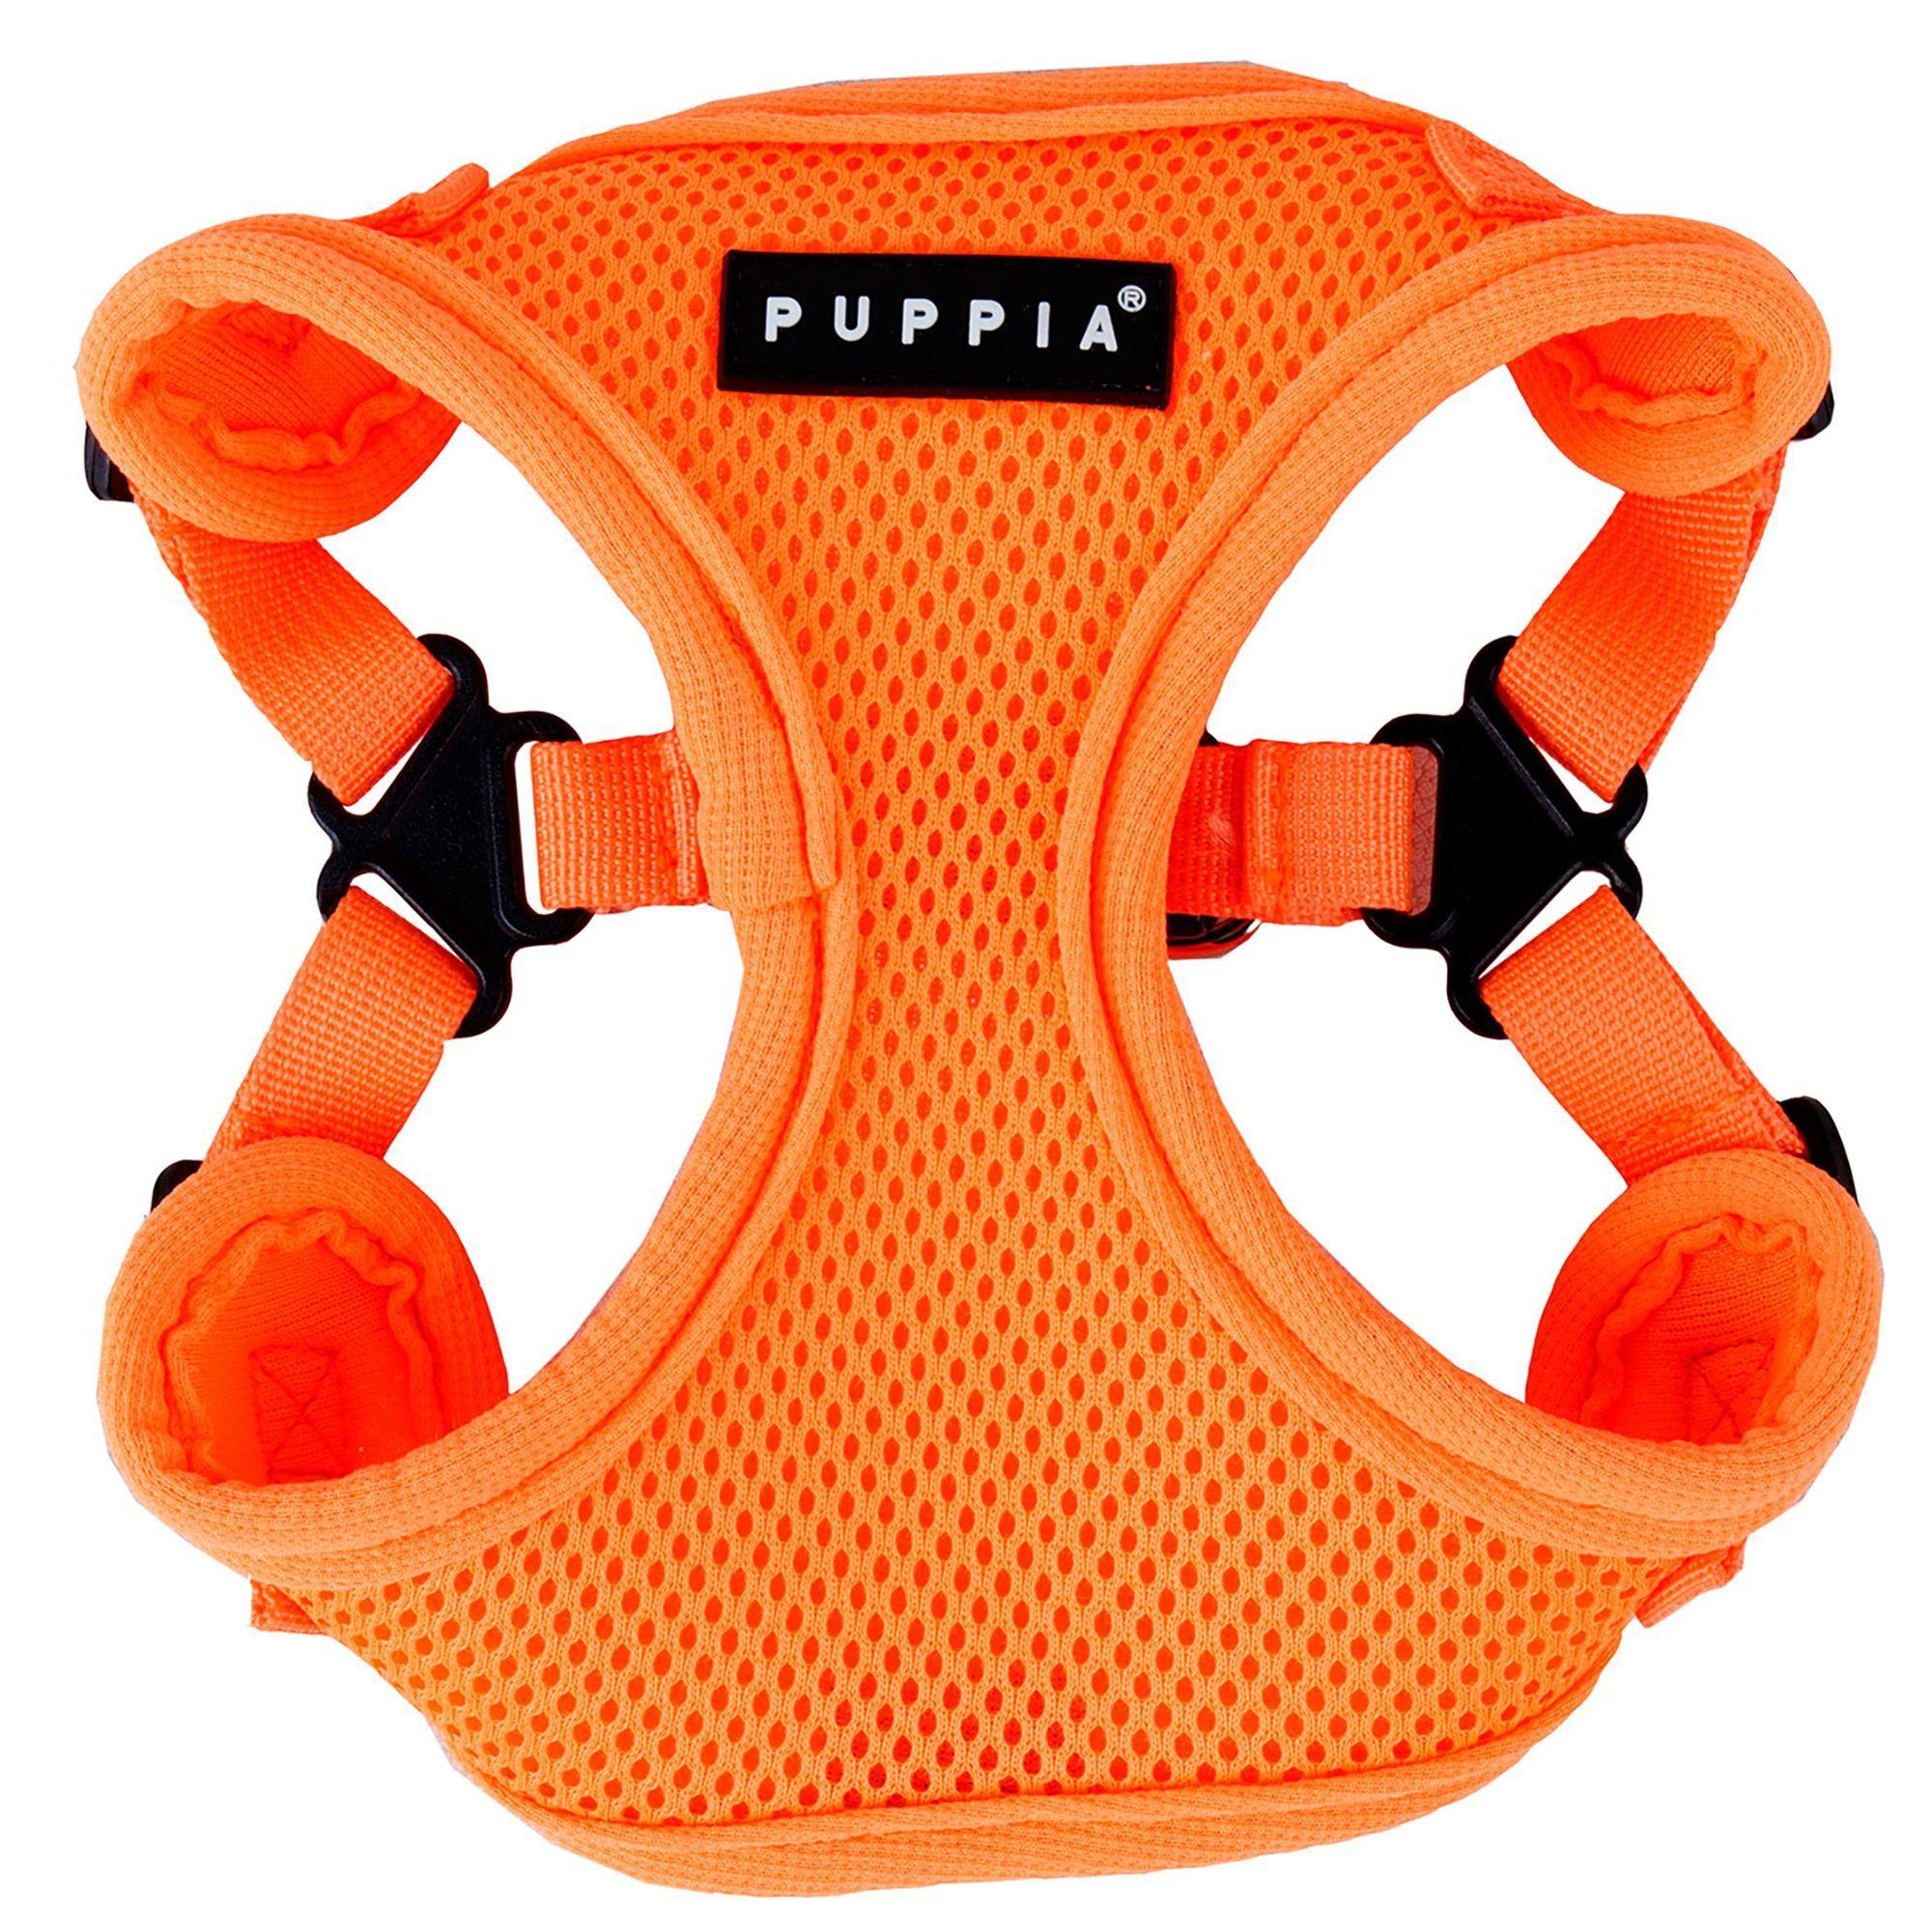 Puppia Soft Dog Harness Petsmart References